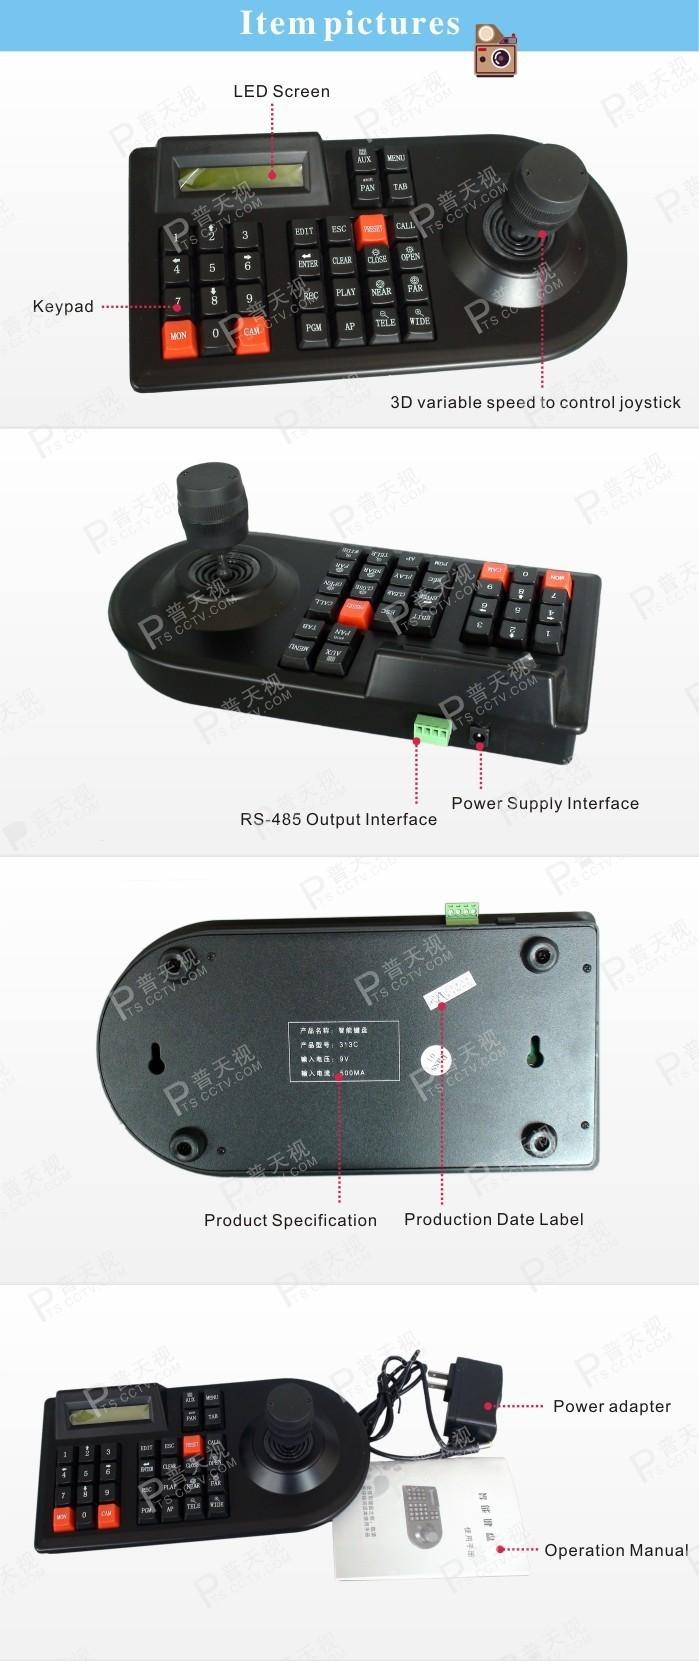 3d Joystick Ptz Keyboard 9vdc For Cctv Camera Dom Rs485 Control Pelco Wiring Diagram Pts3103c